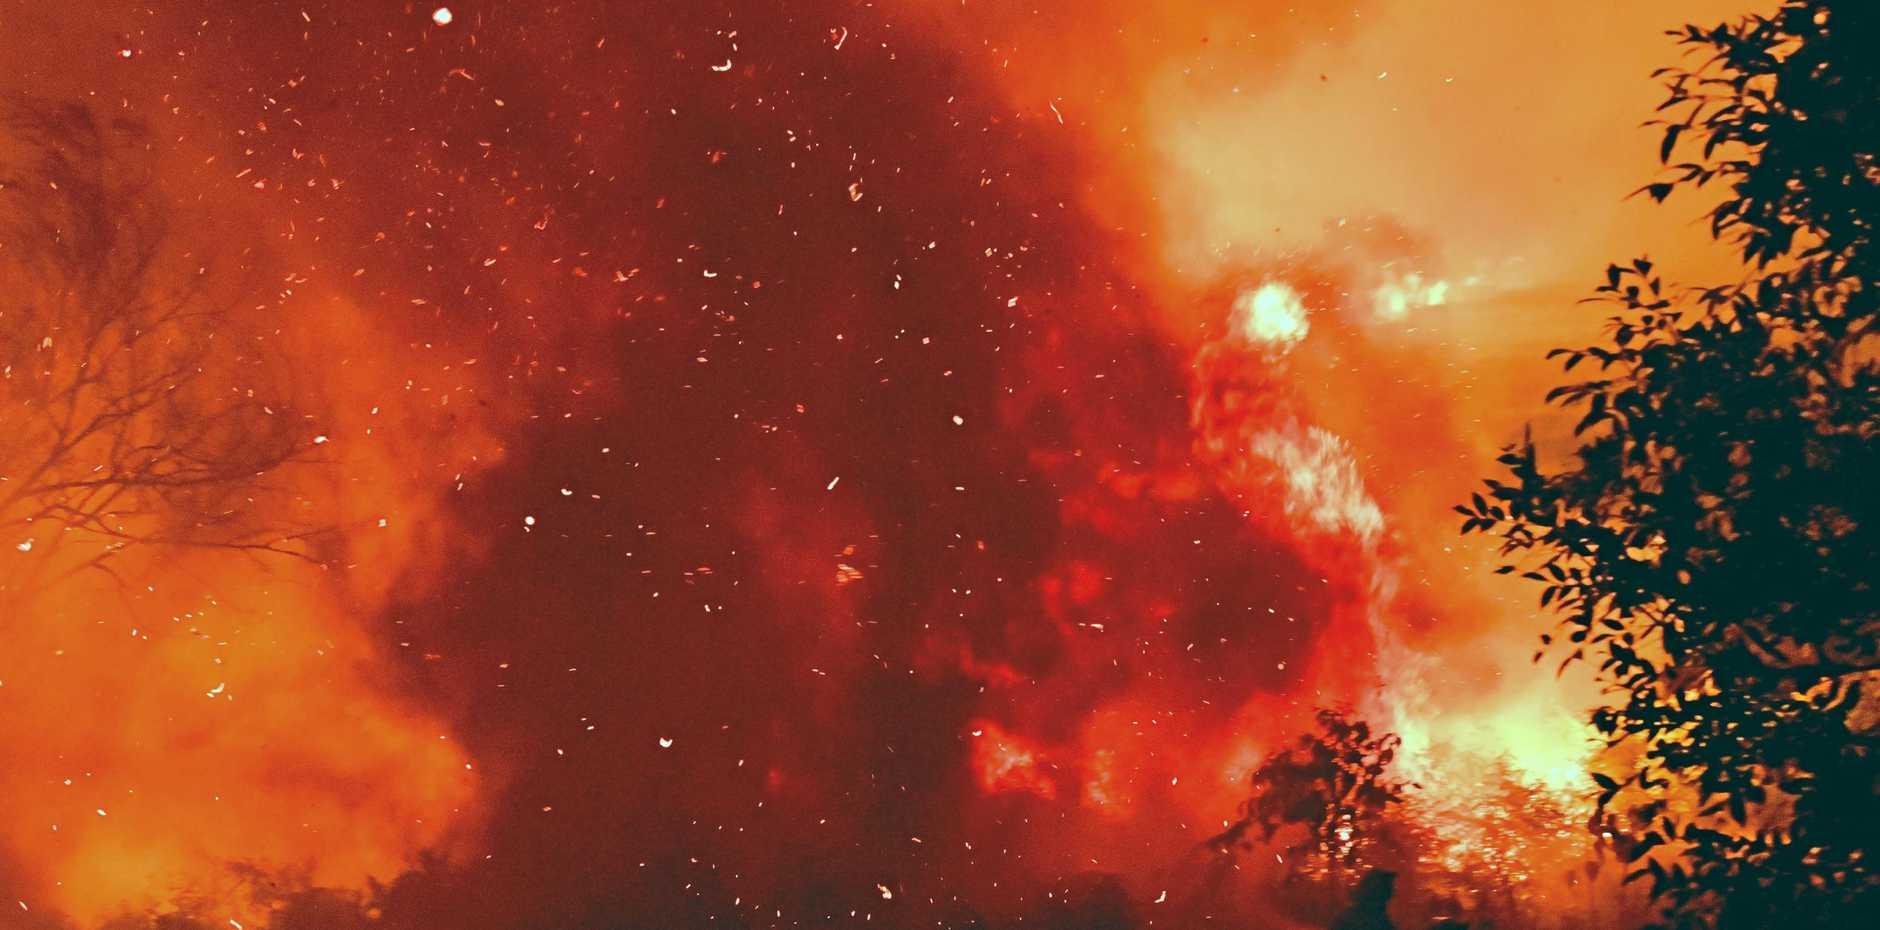 Firefighters have been battling major blazes across Northern NSW.